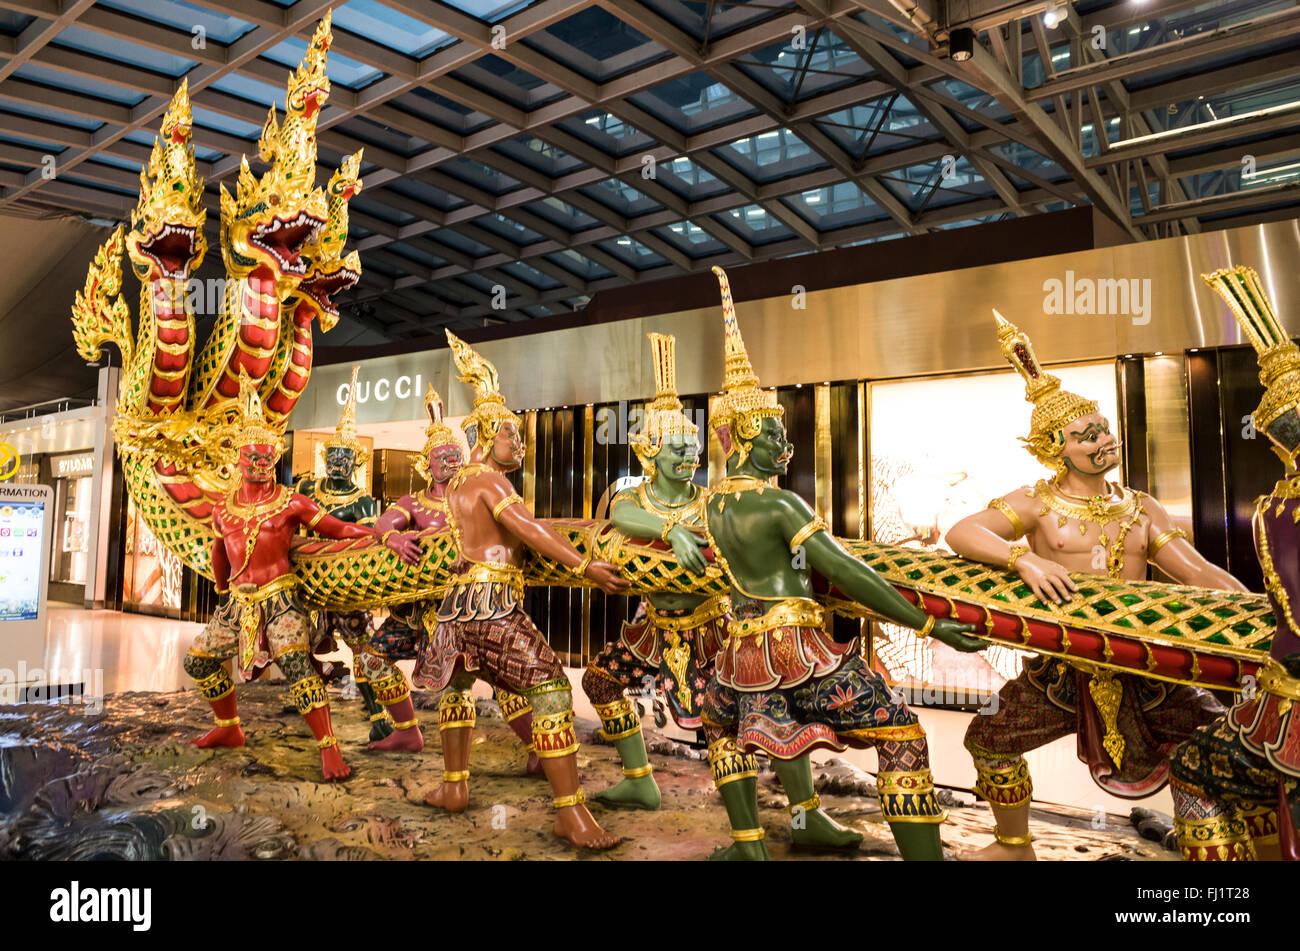 Un display ornati in Suvarnabhumi Airport Terminal, Bangkok, Thailandia. Immagini Stock